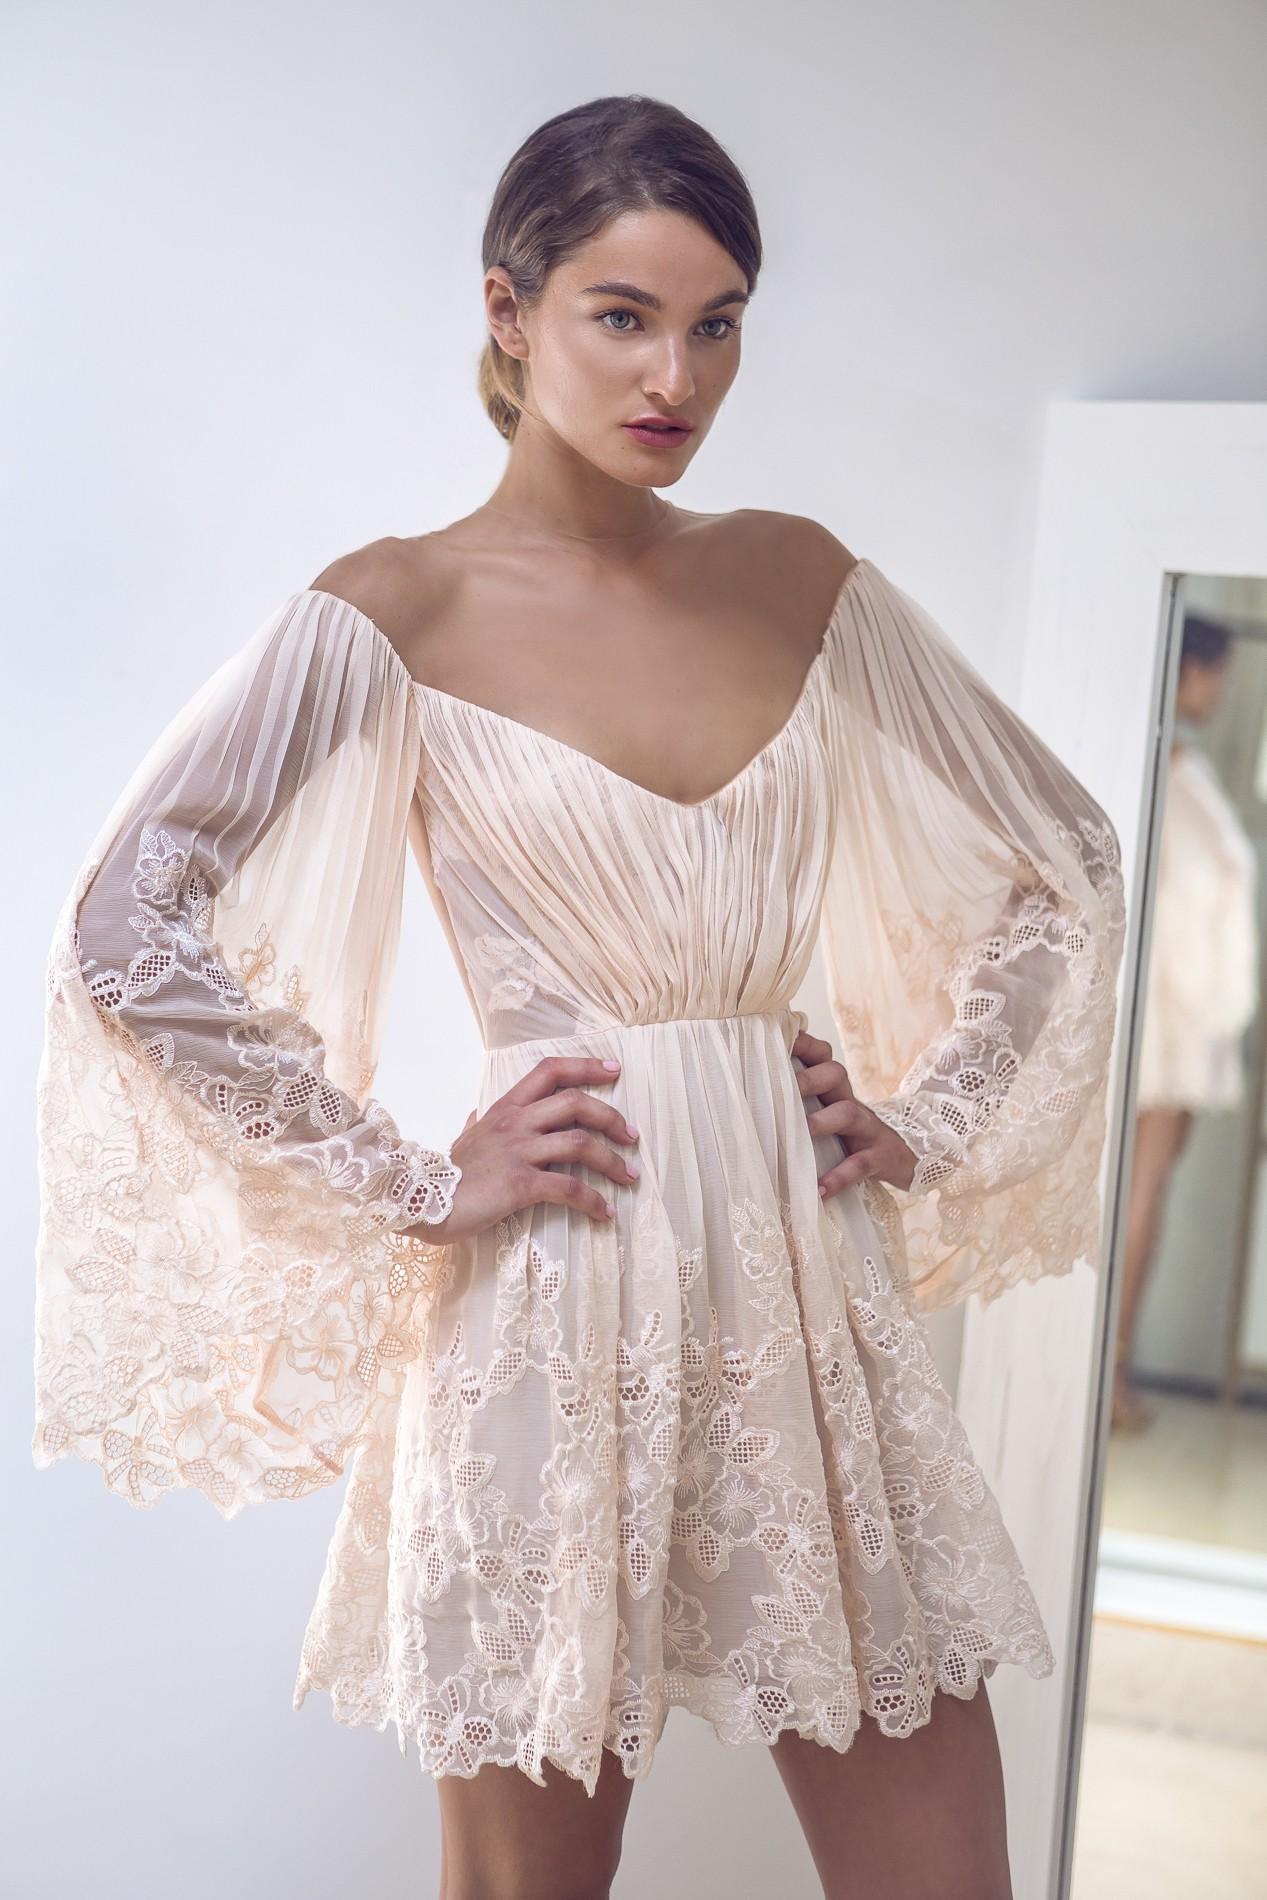 Short Lace Boho Dress Rhea Costa Shop